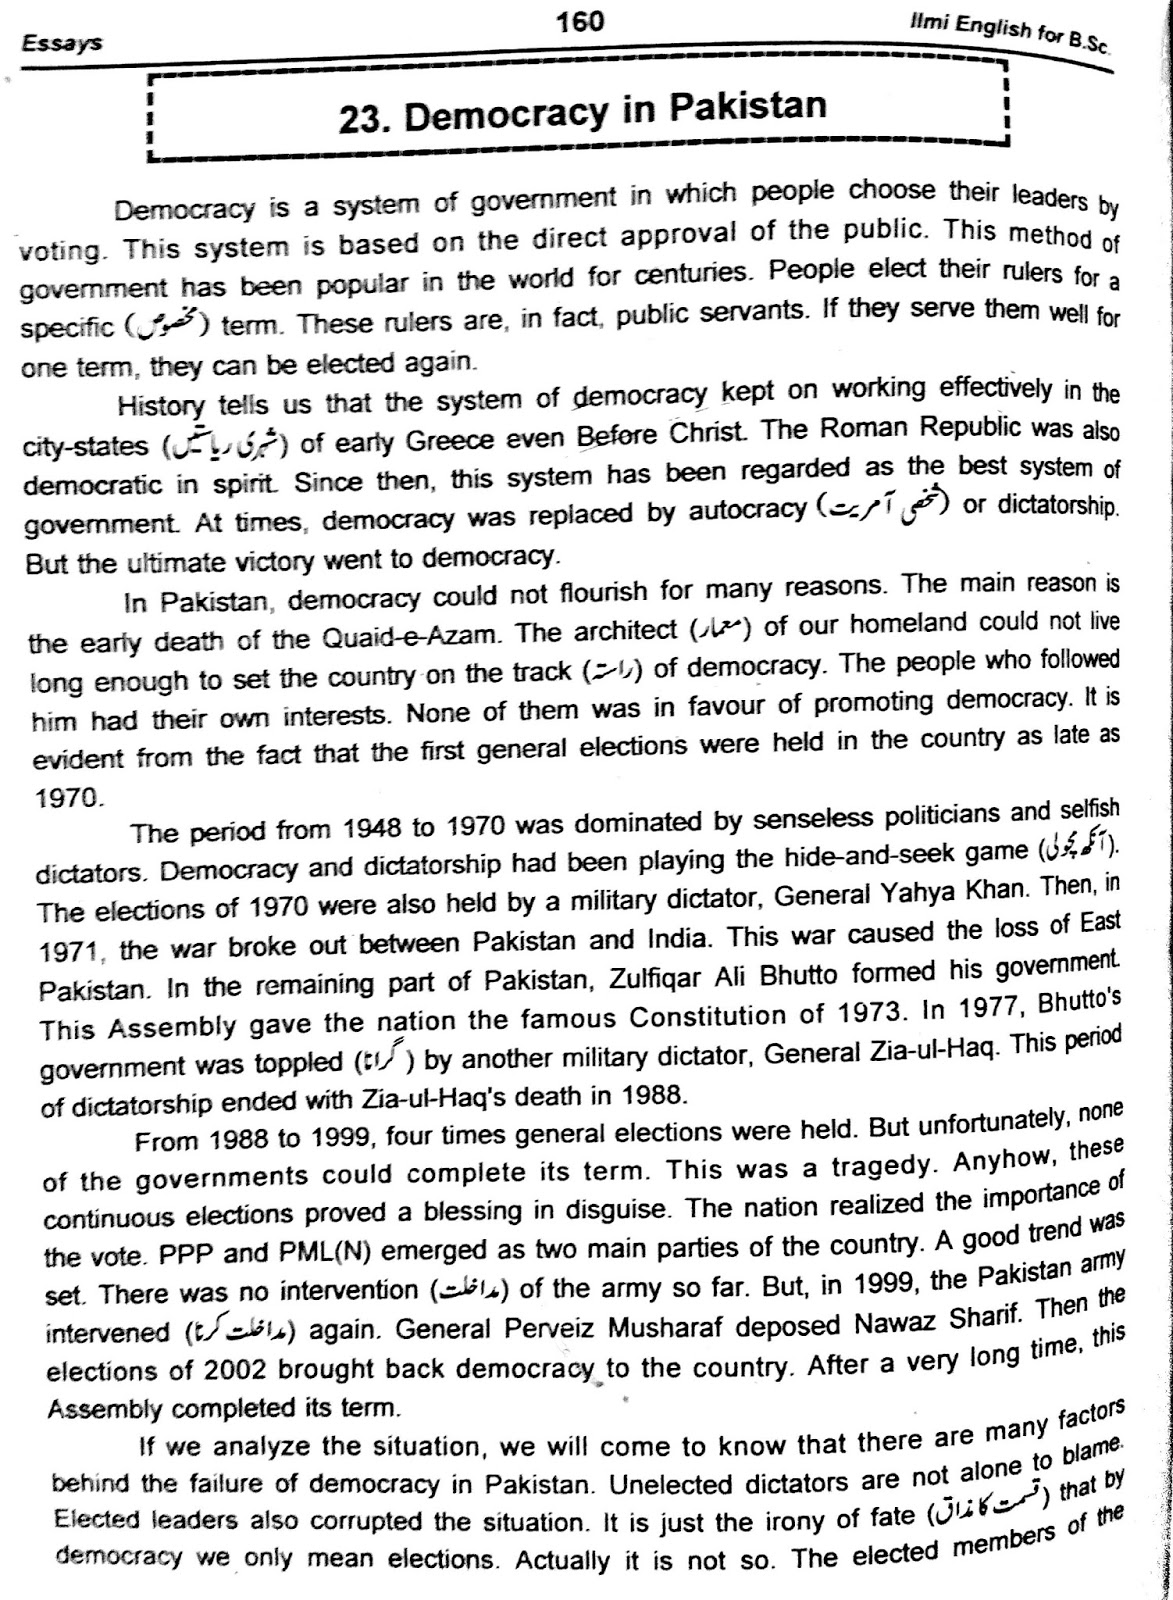 001 Democracy Essay Democracyinpakistan28129 Shocking In Urdu Pdf Pakistan English 200 Words Full